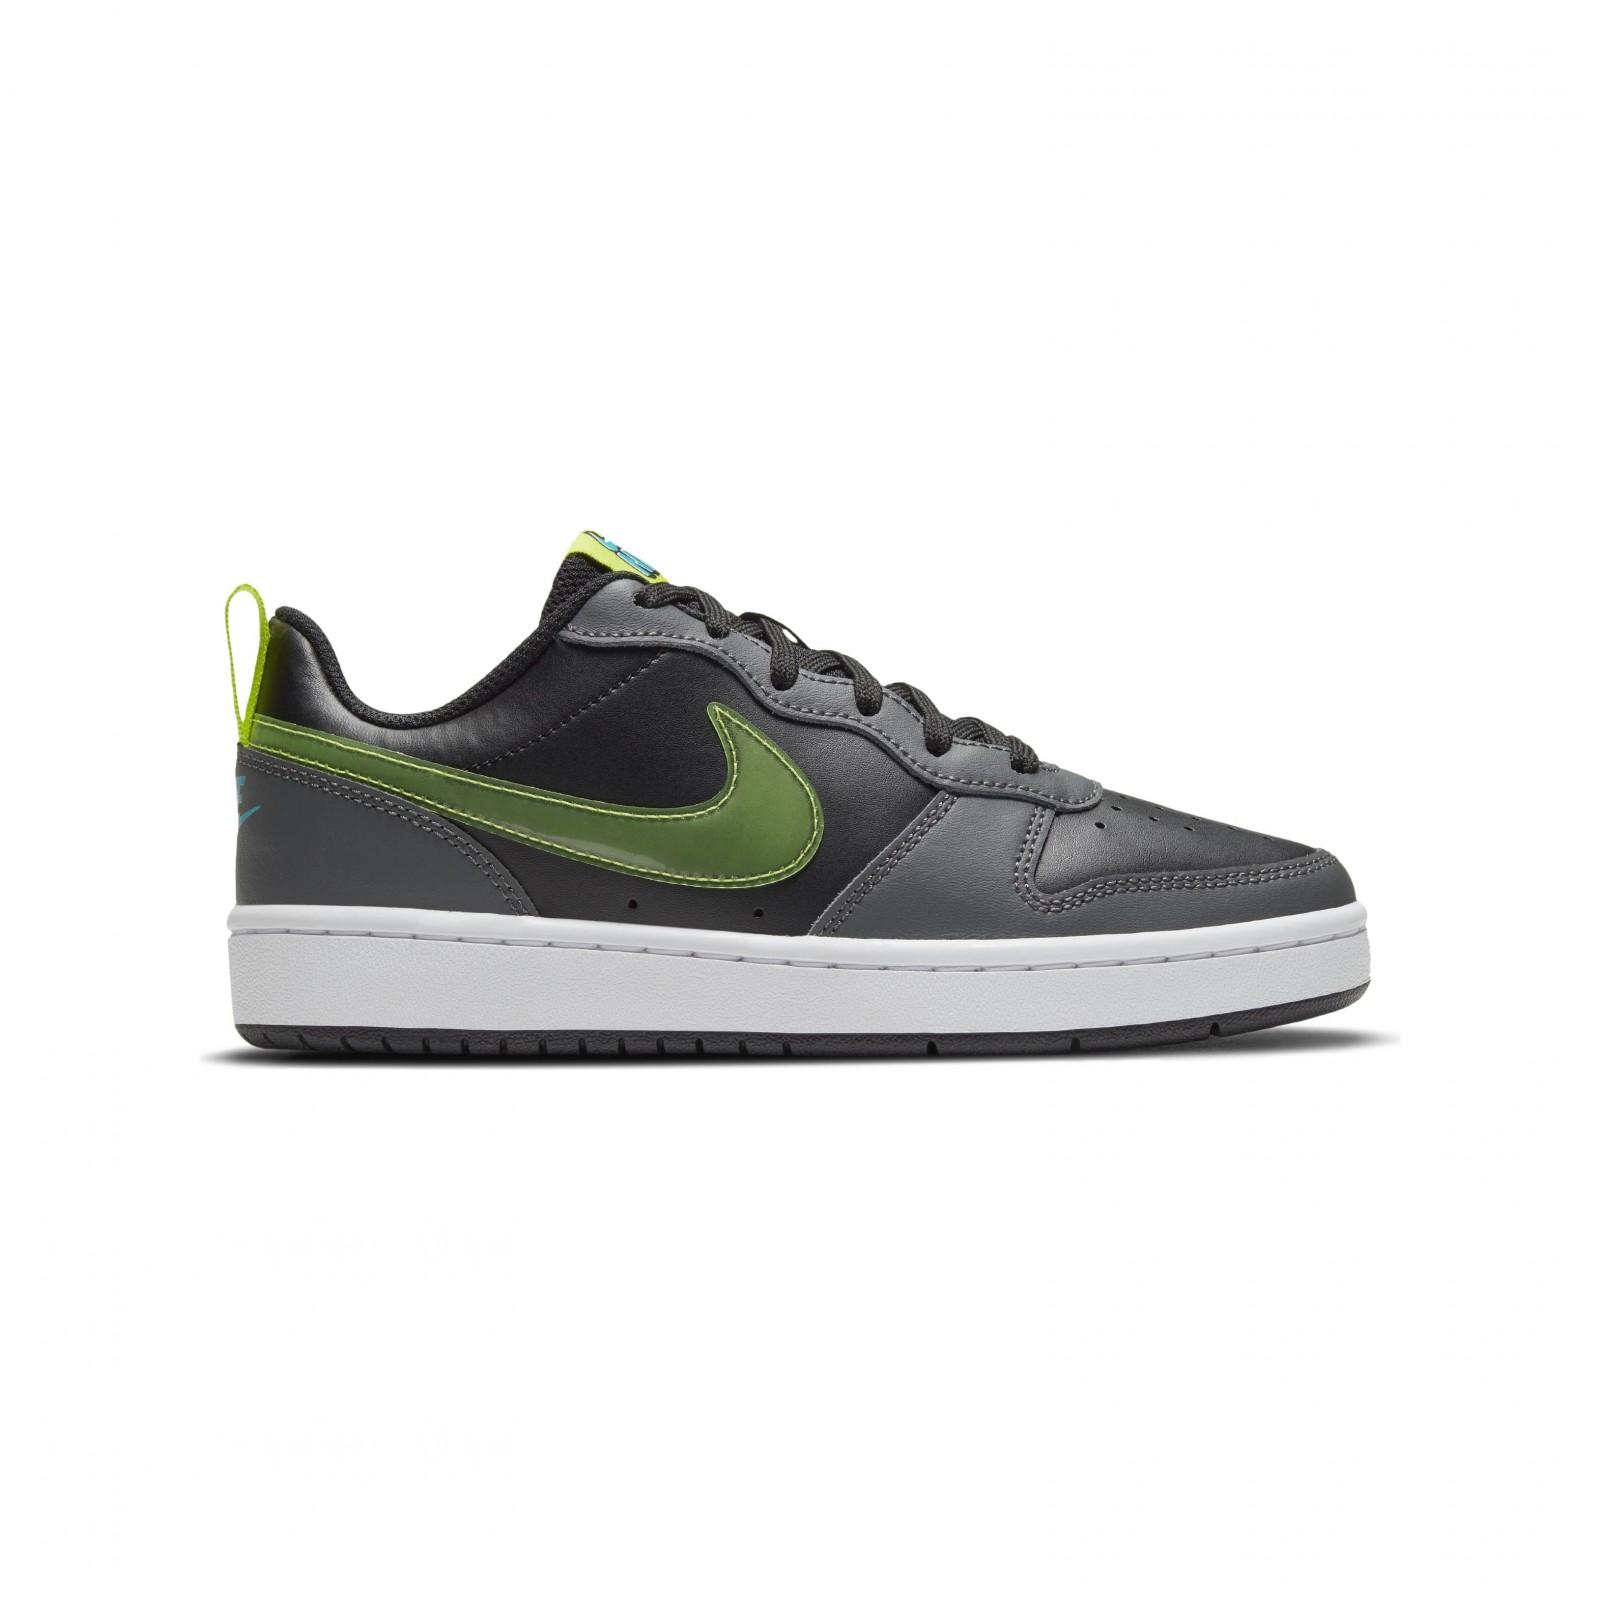 Nike Court Borough Low 2 BLACK/CYBER-IRON GREY-AQUAMARINE